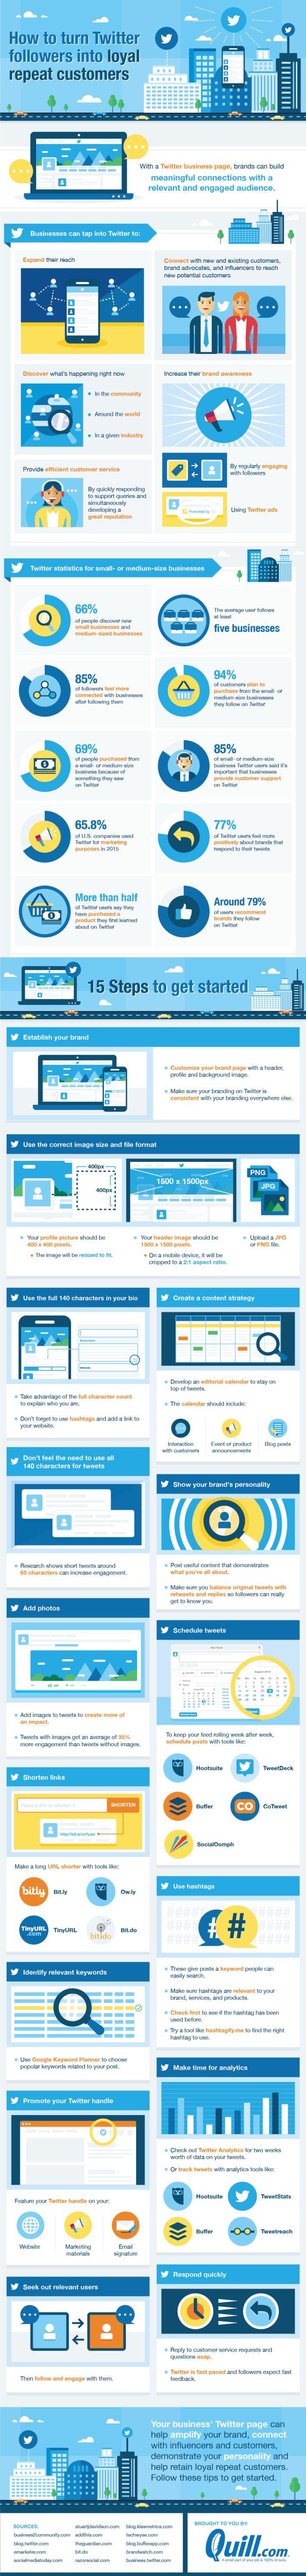 Twitter Marketing Tips 15mStepsmtomBuildmFollowersmGainm Customers